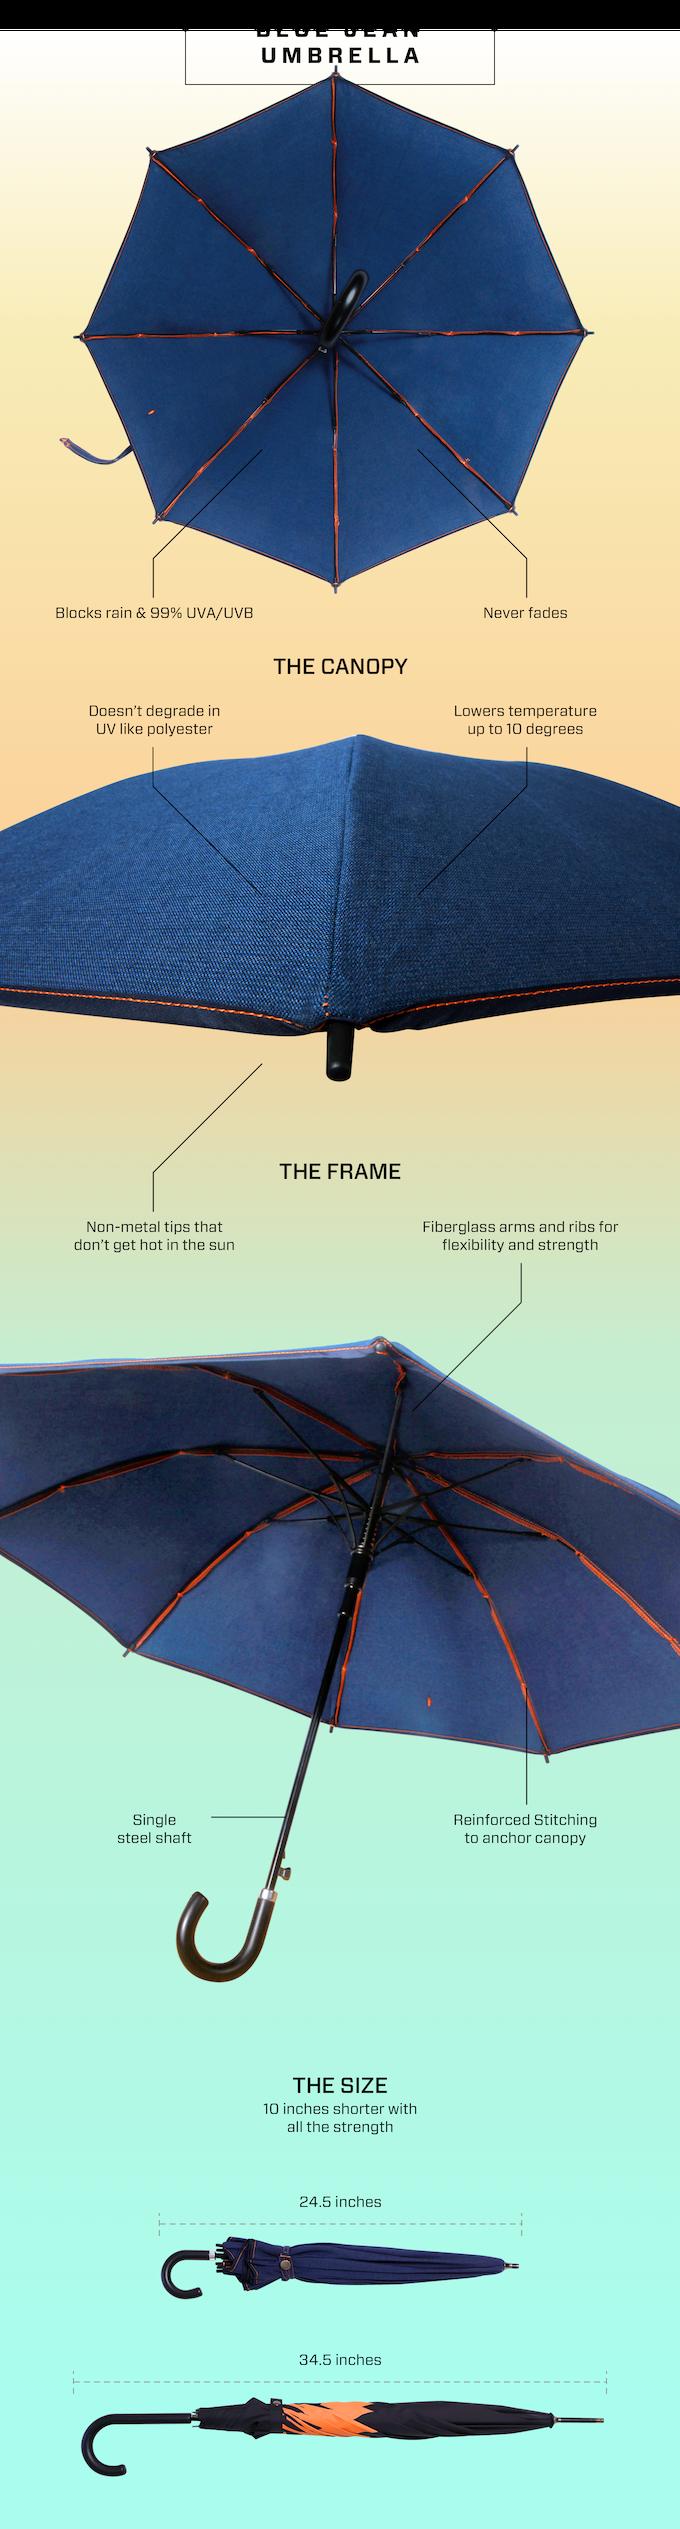 Blue Jean Umbrella For Sun And Rain By San Francisco